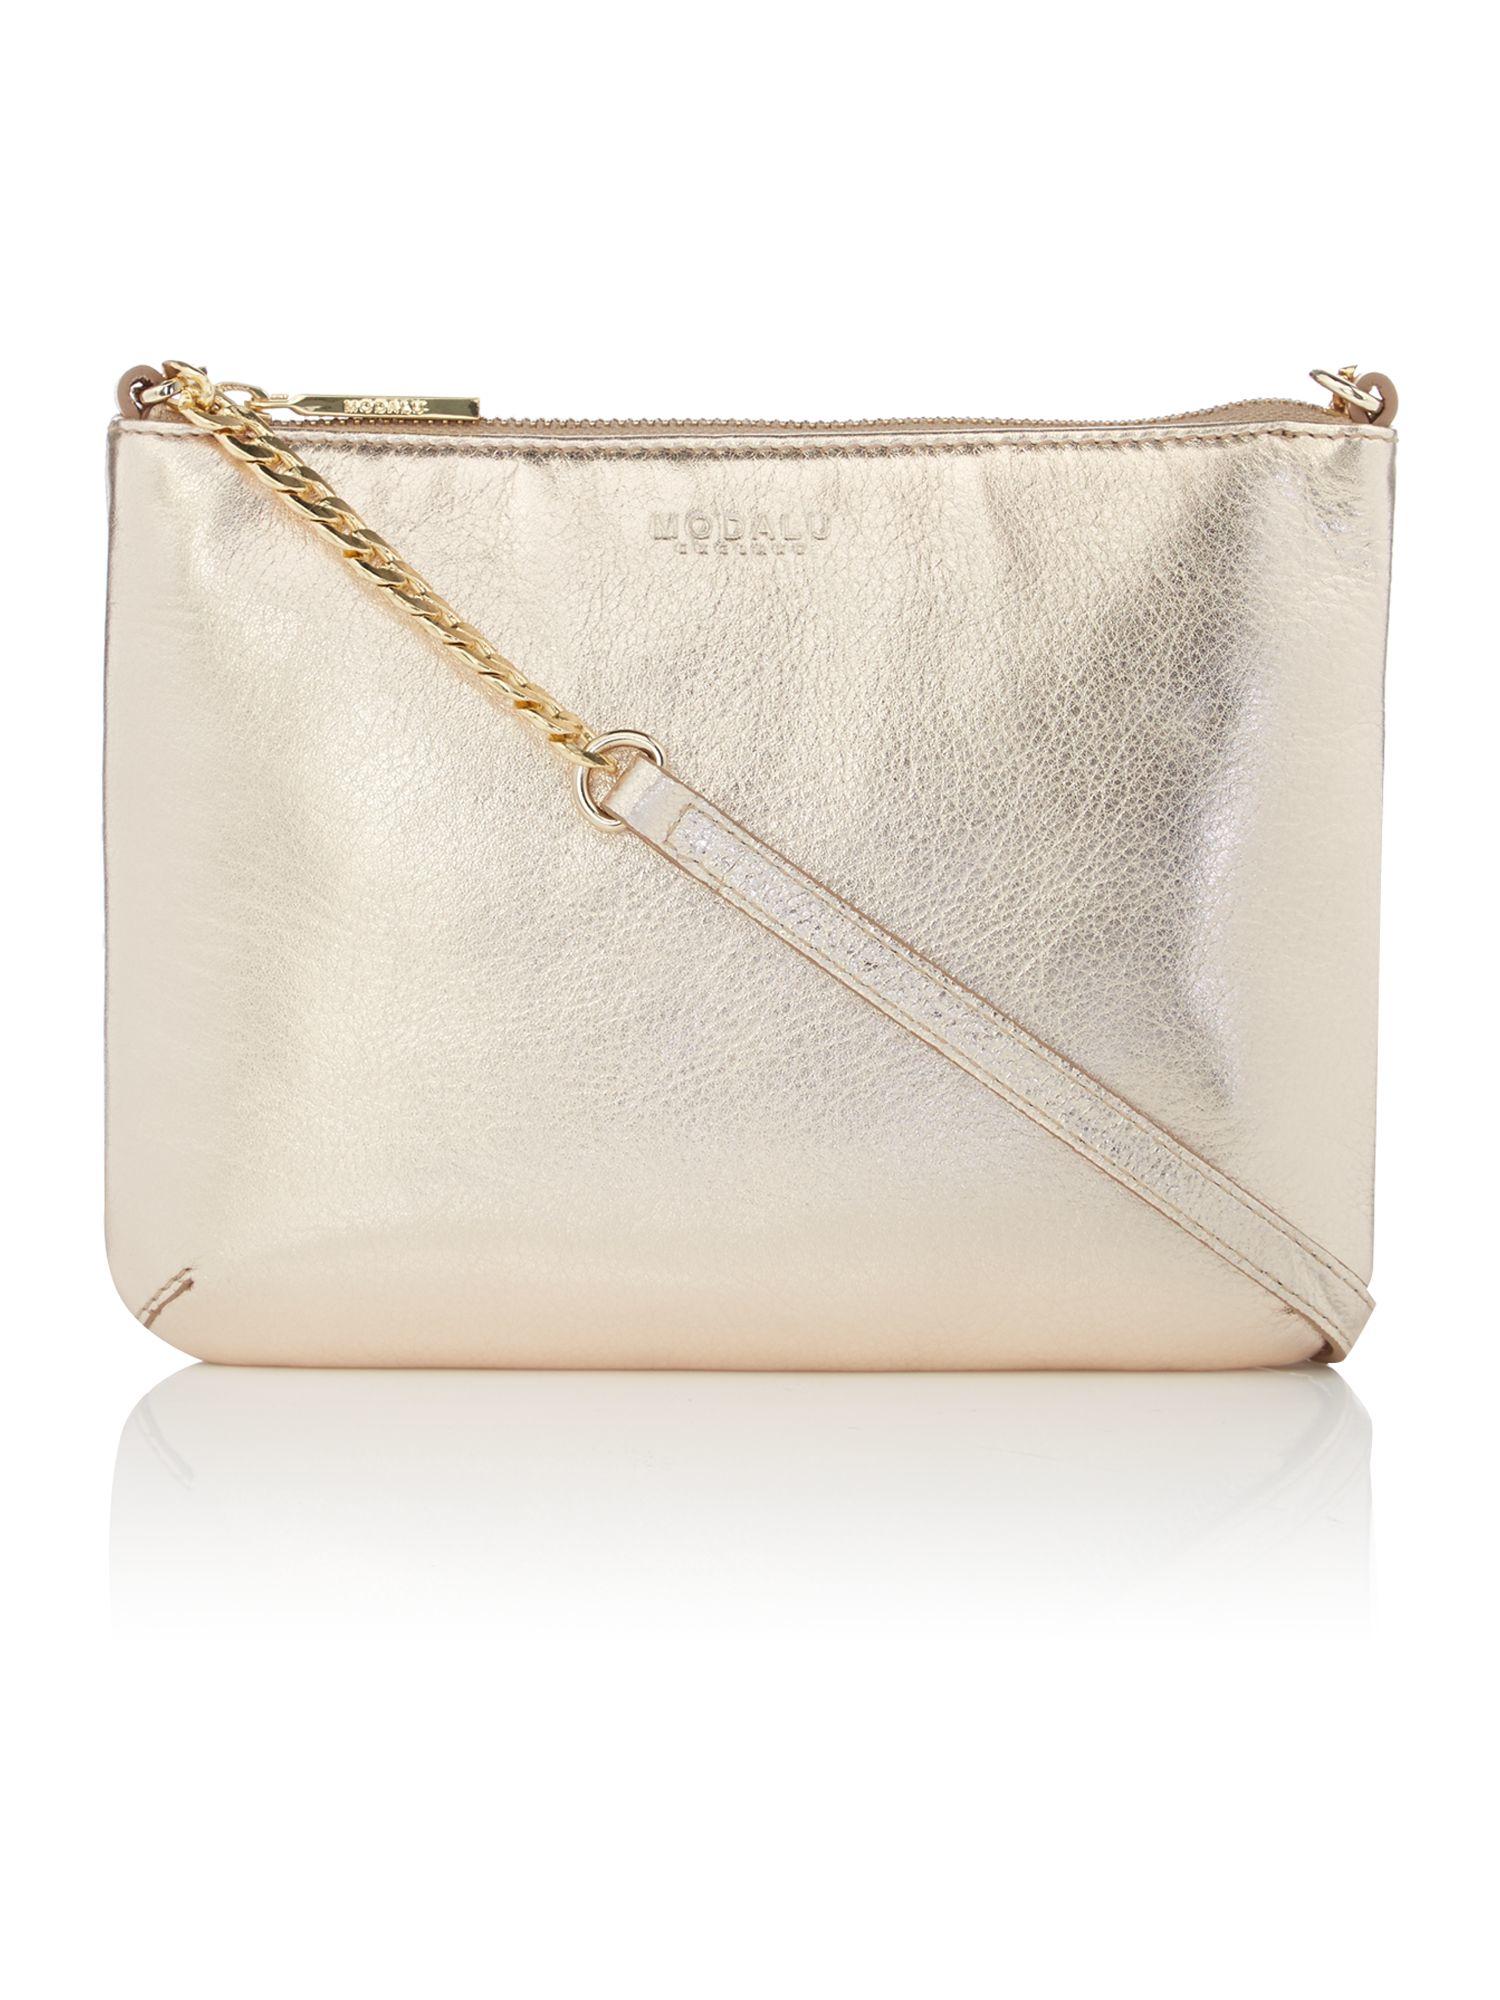 Image Result For Modalu Handbags